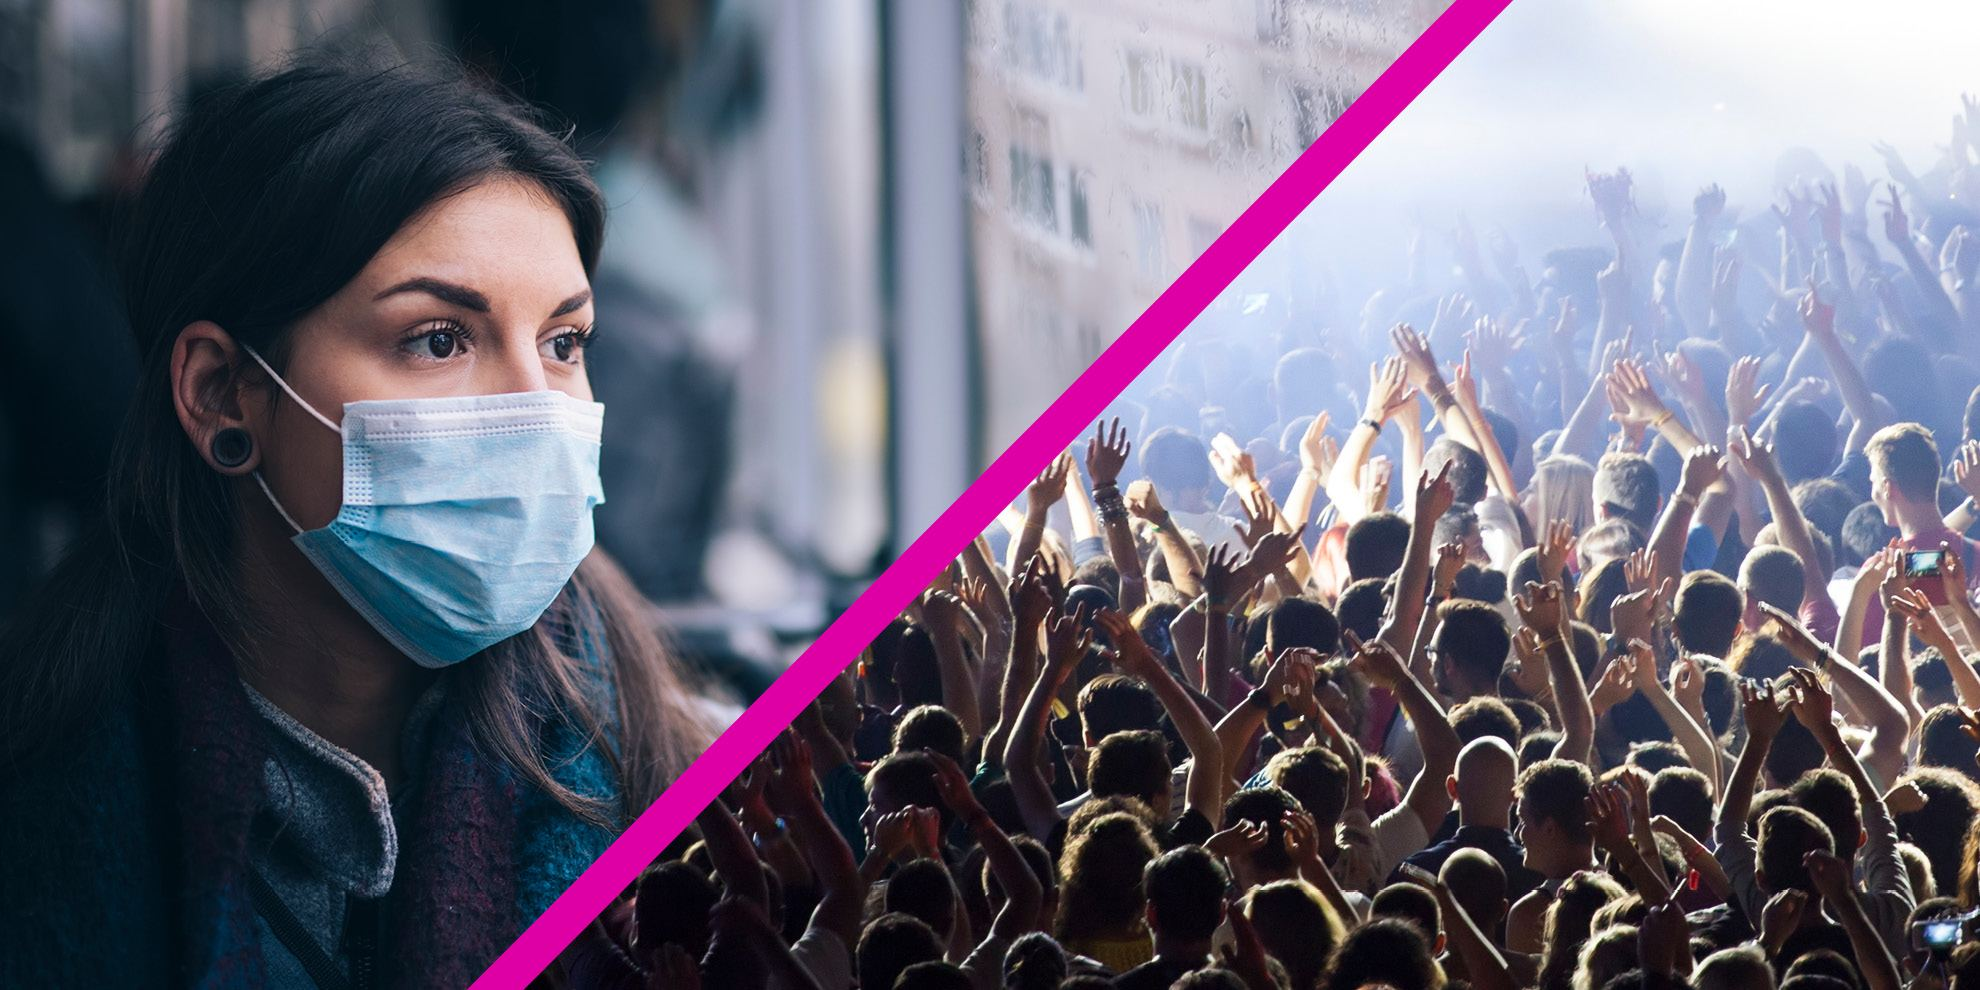 COVID-19: The Cultural Impact of Coronavirus - Blog - FutureLearn